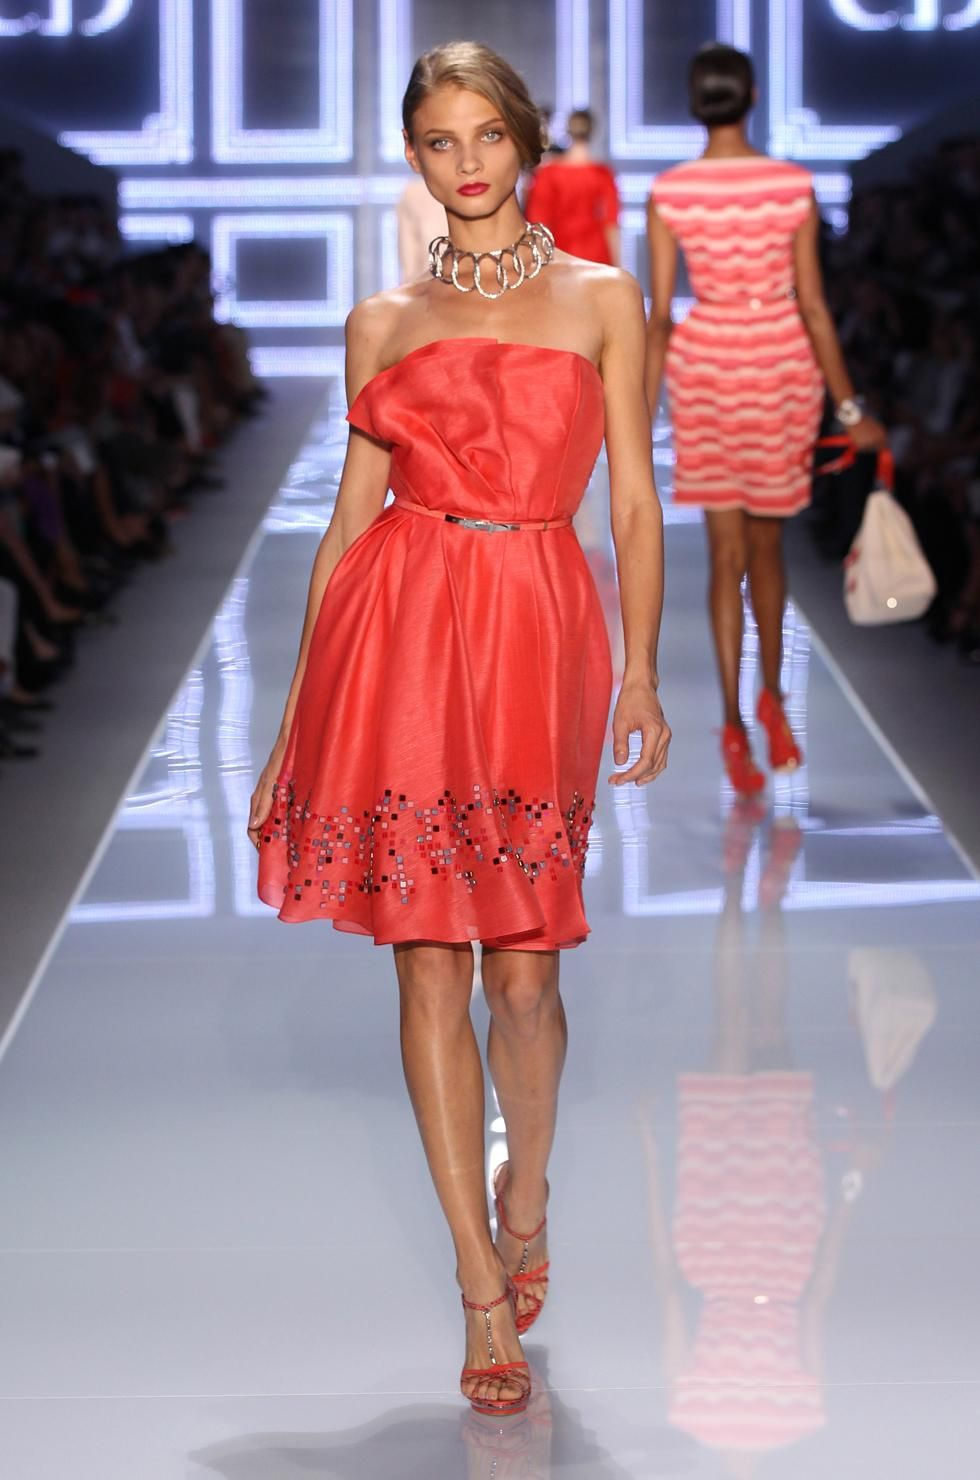 Christian-Dior-Spring-Summer-2012-Ready-to-wear-23.jpg (980×1480)